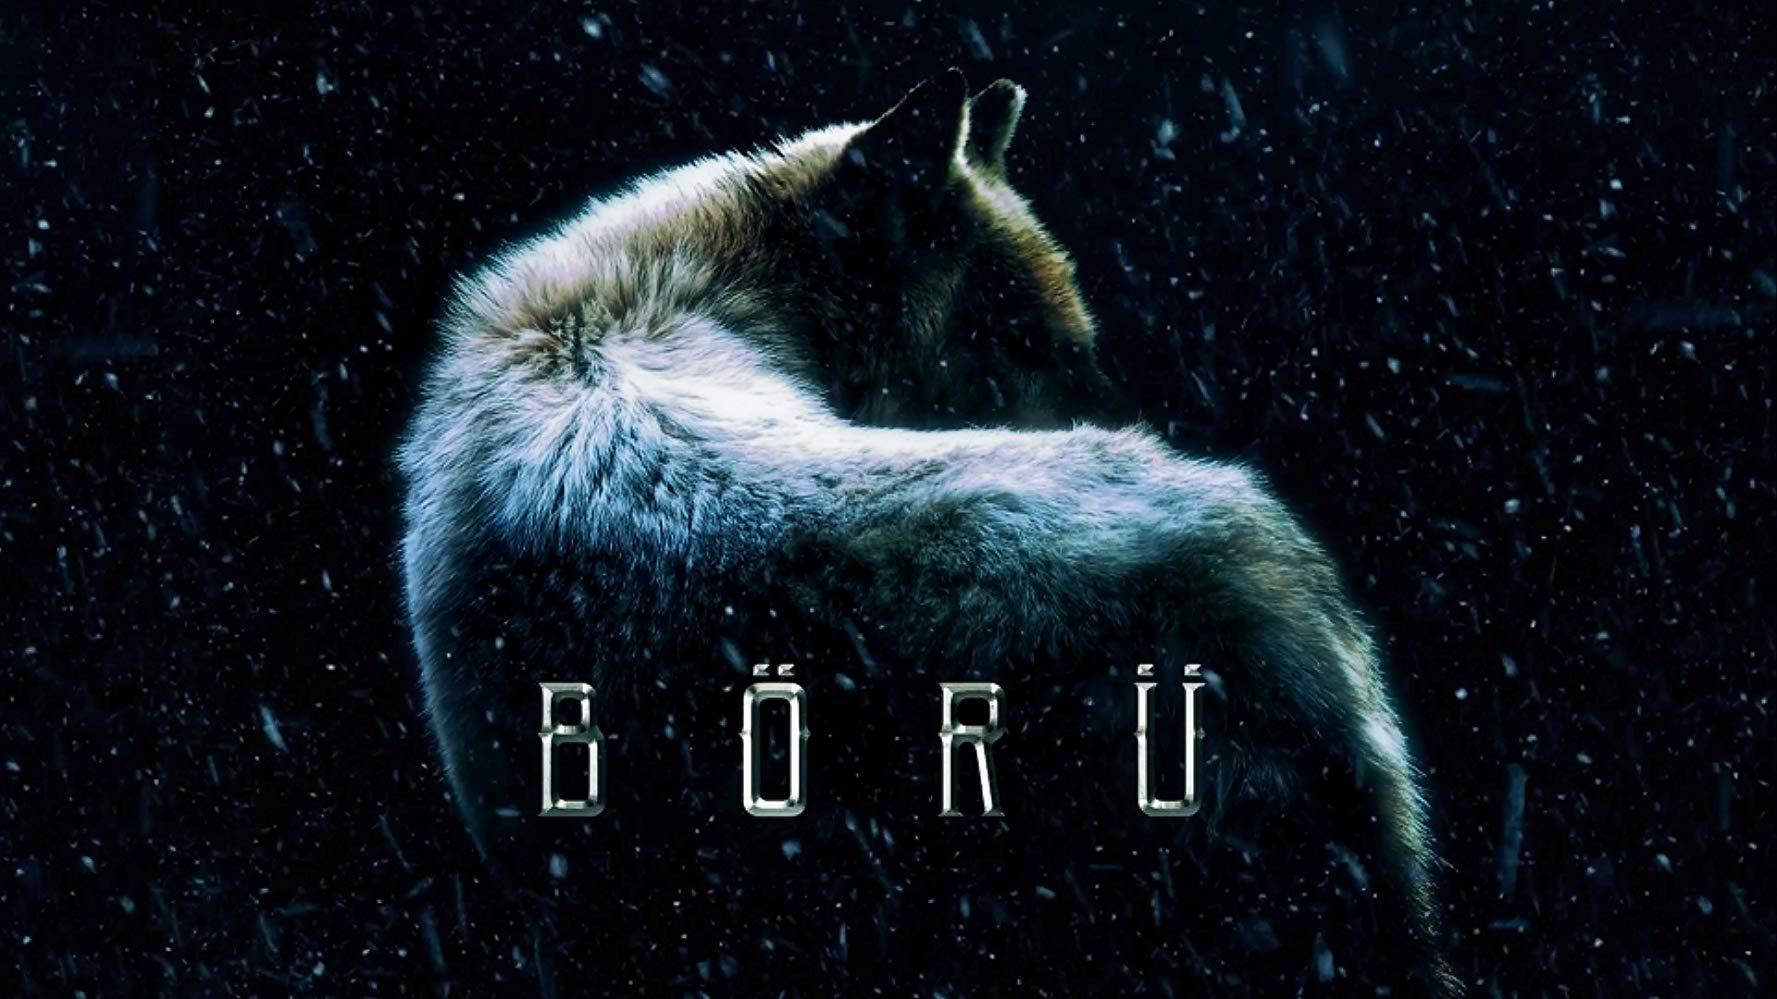 Wolf - Season 1 [Sub: Eng]